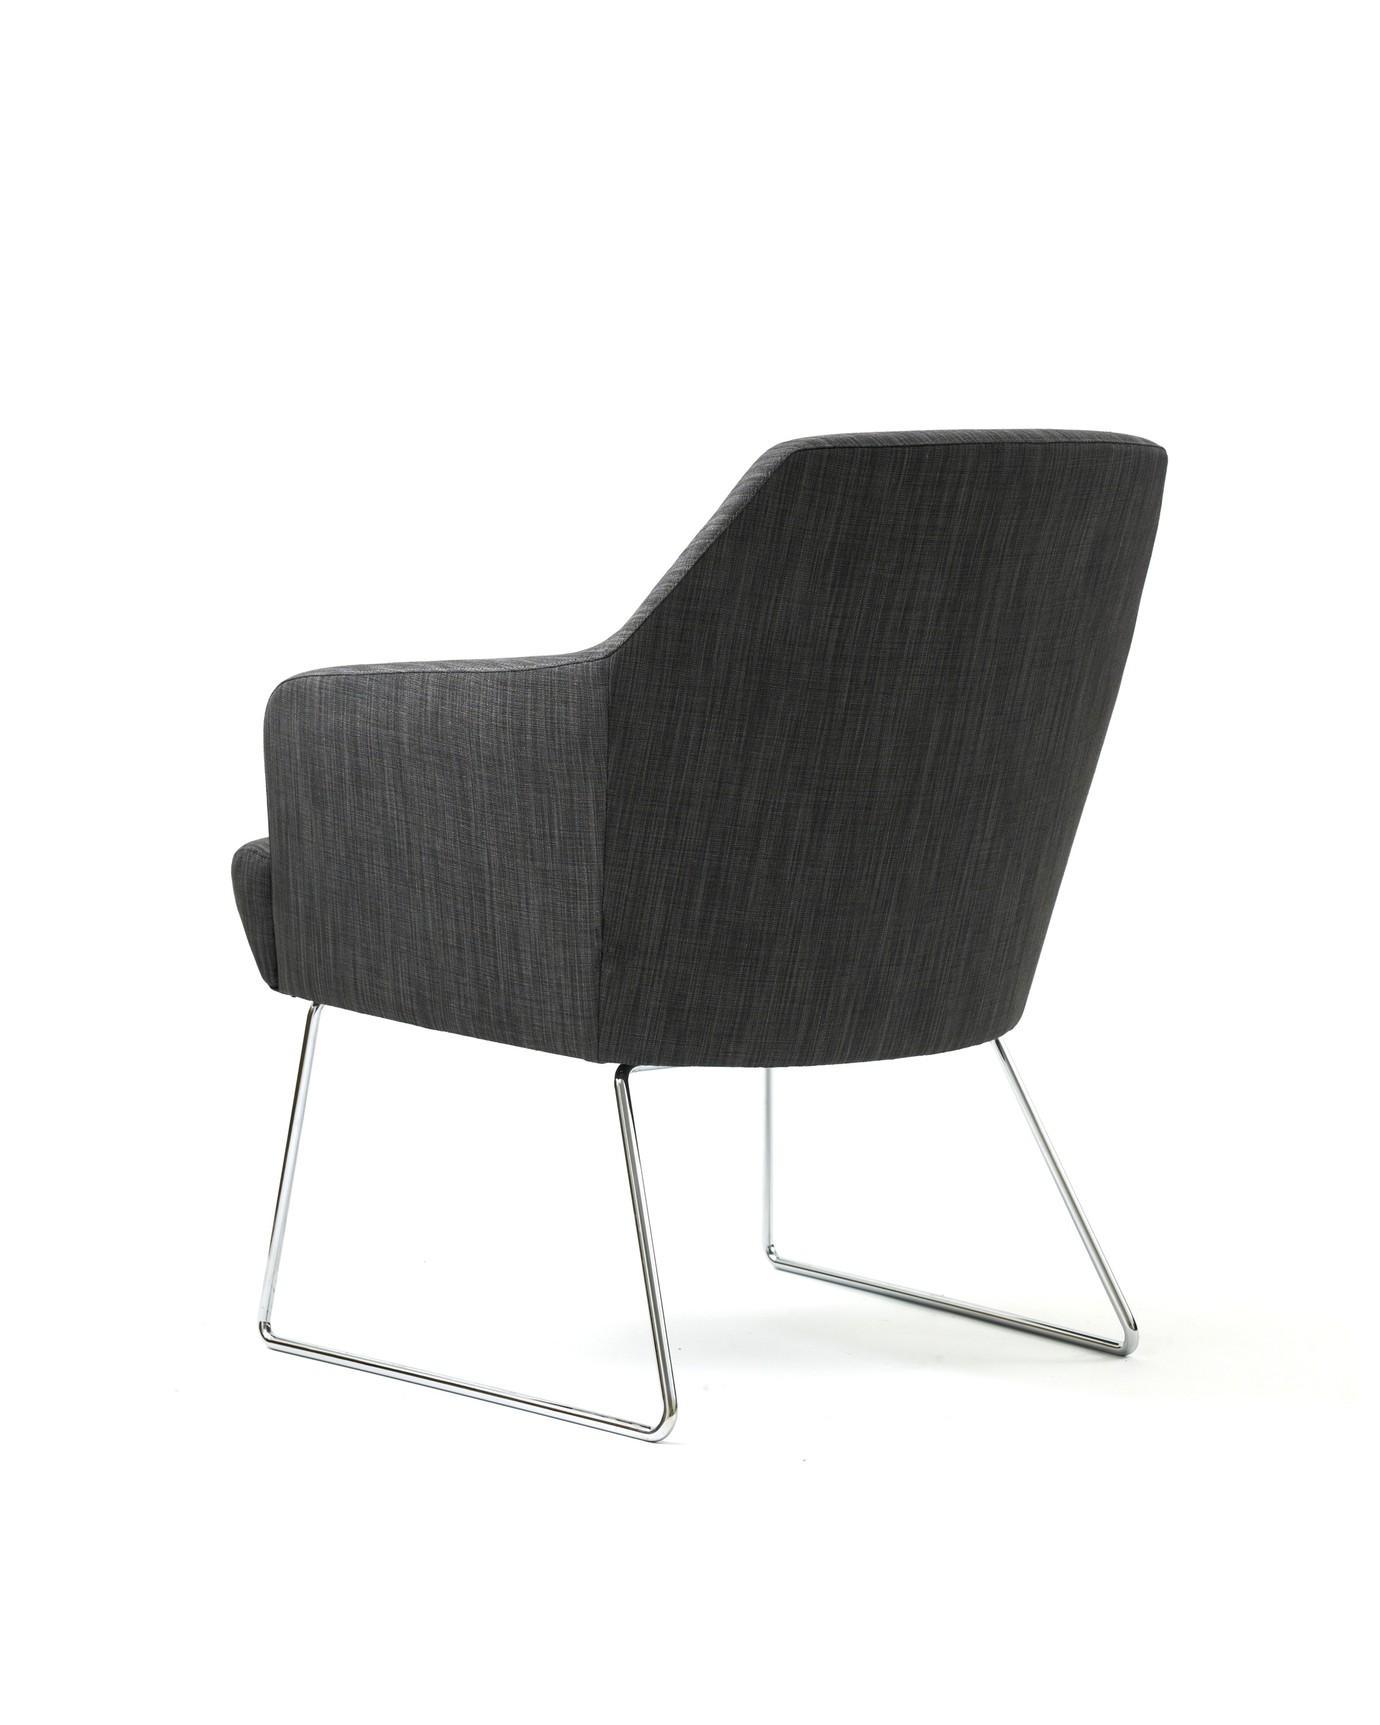 2-Silla-Multiuso-Jetty-Lounge-1-1380